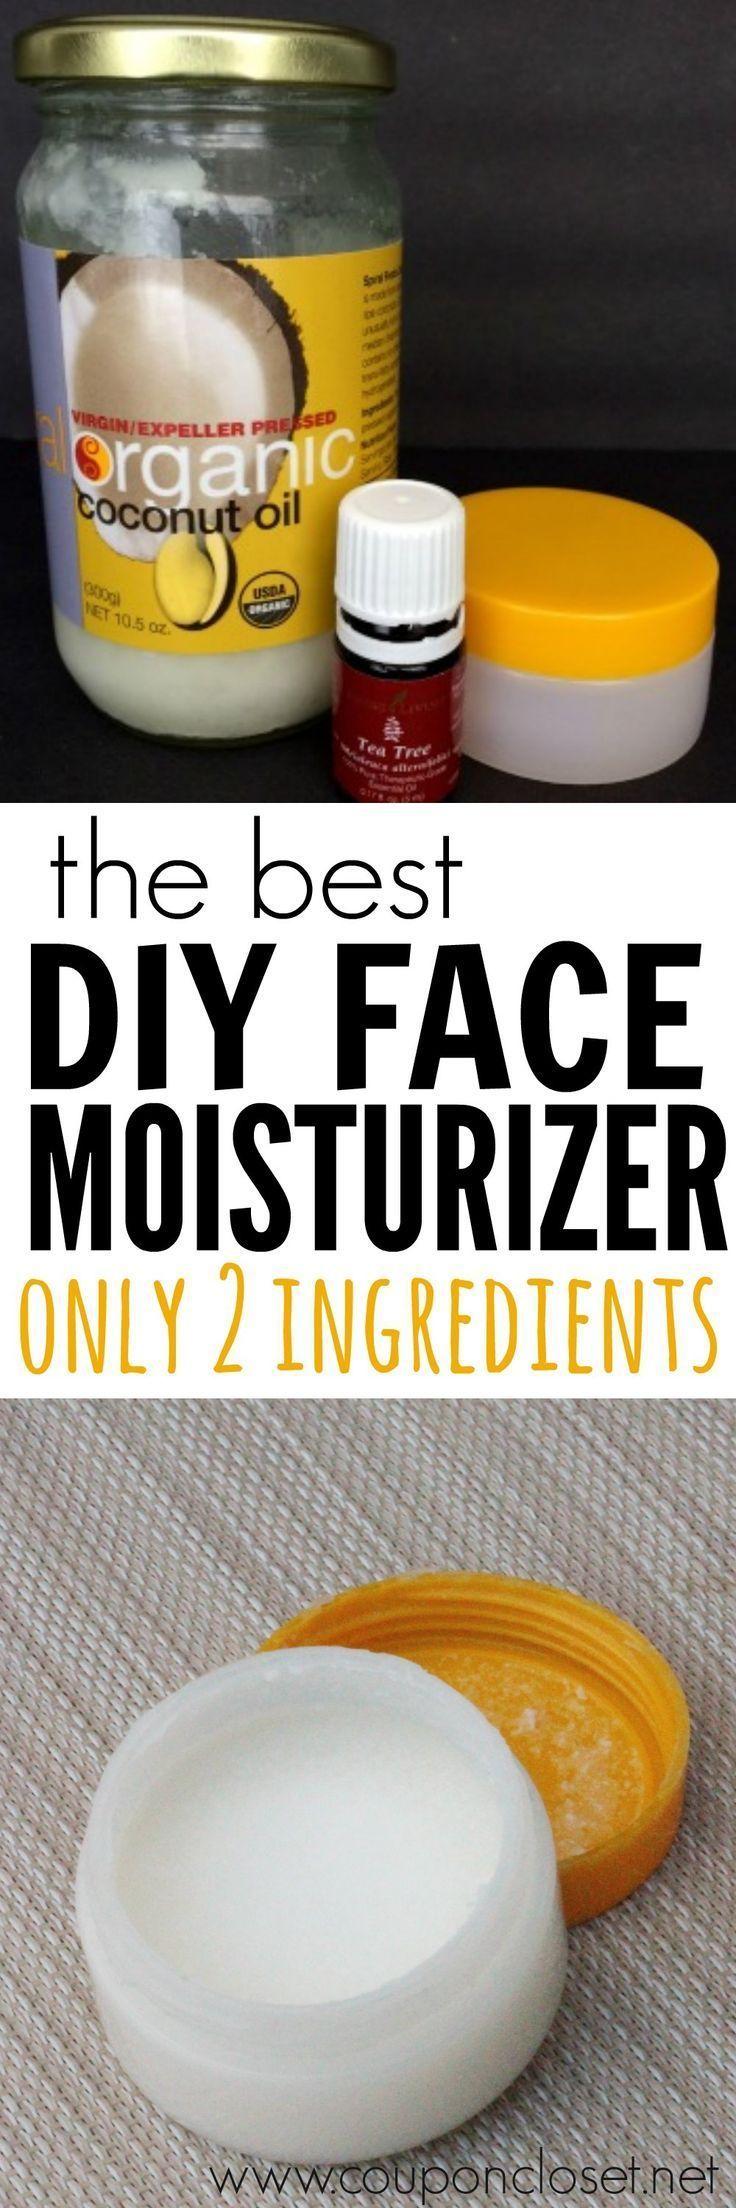 DIY Face Moisturizer best homemade face moisturizer